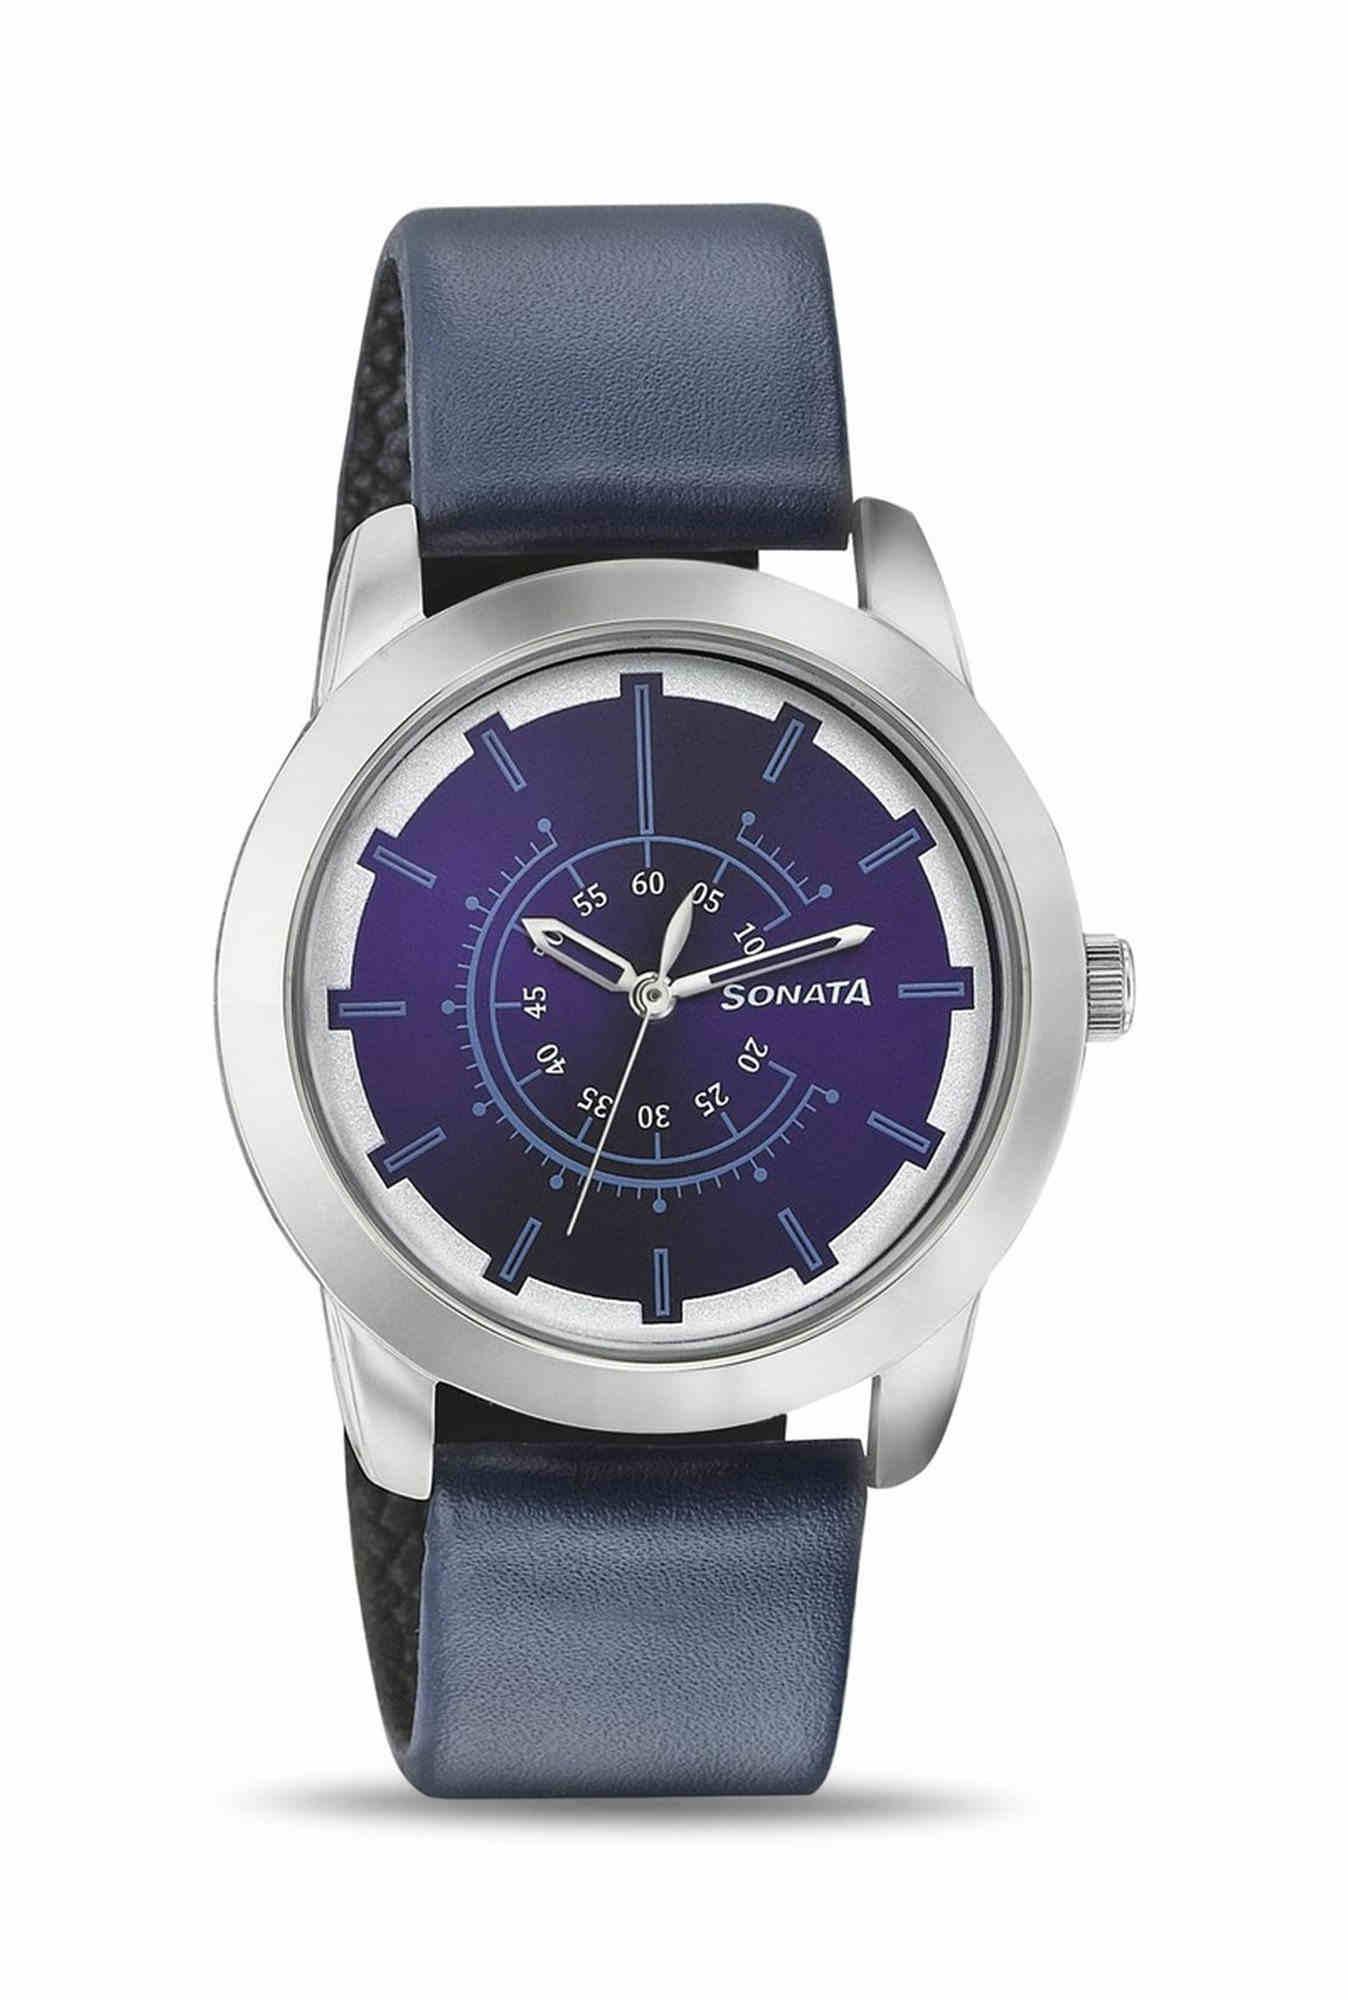 Sonata 7924SL08 Professional Analog Men's Watch (7924SL08)